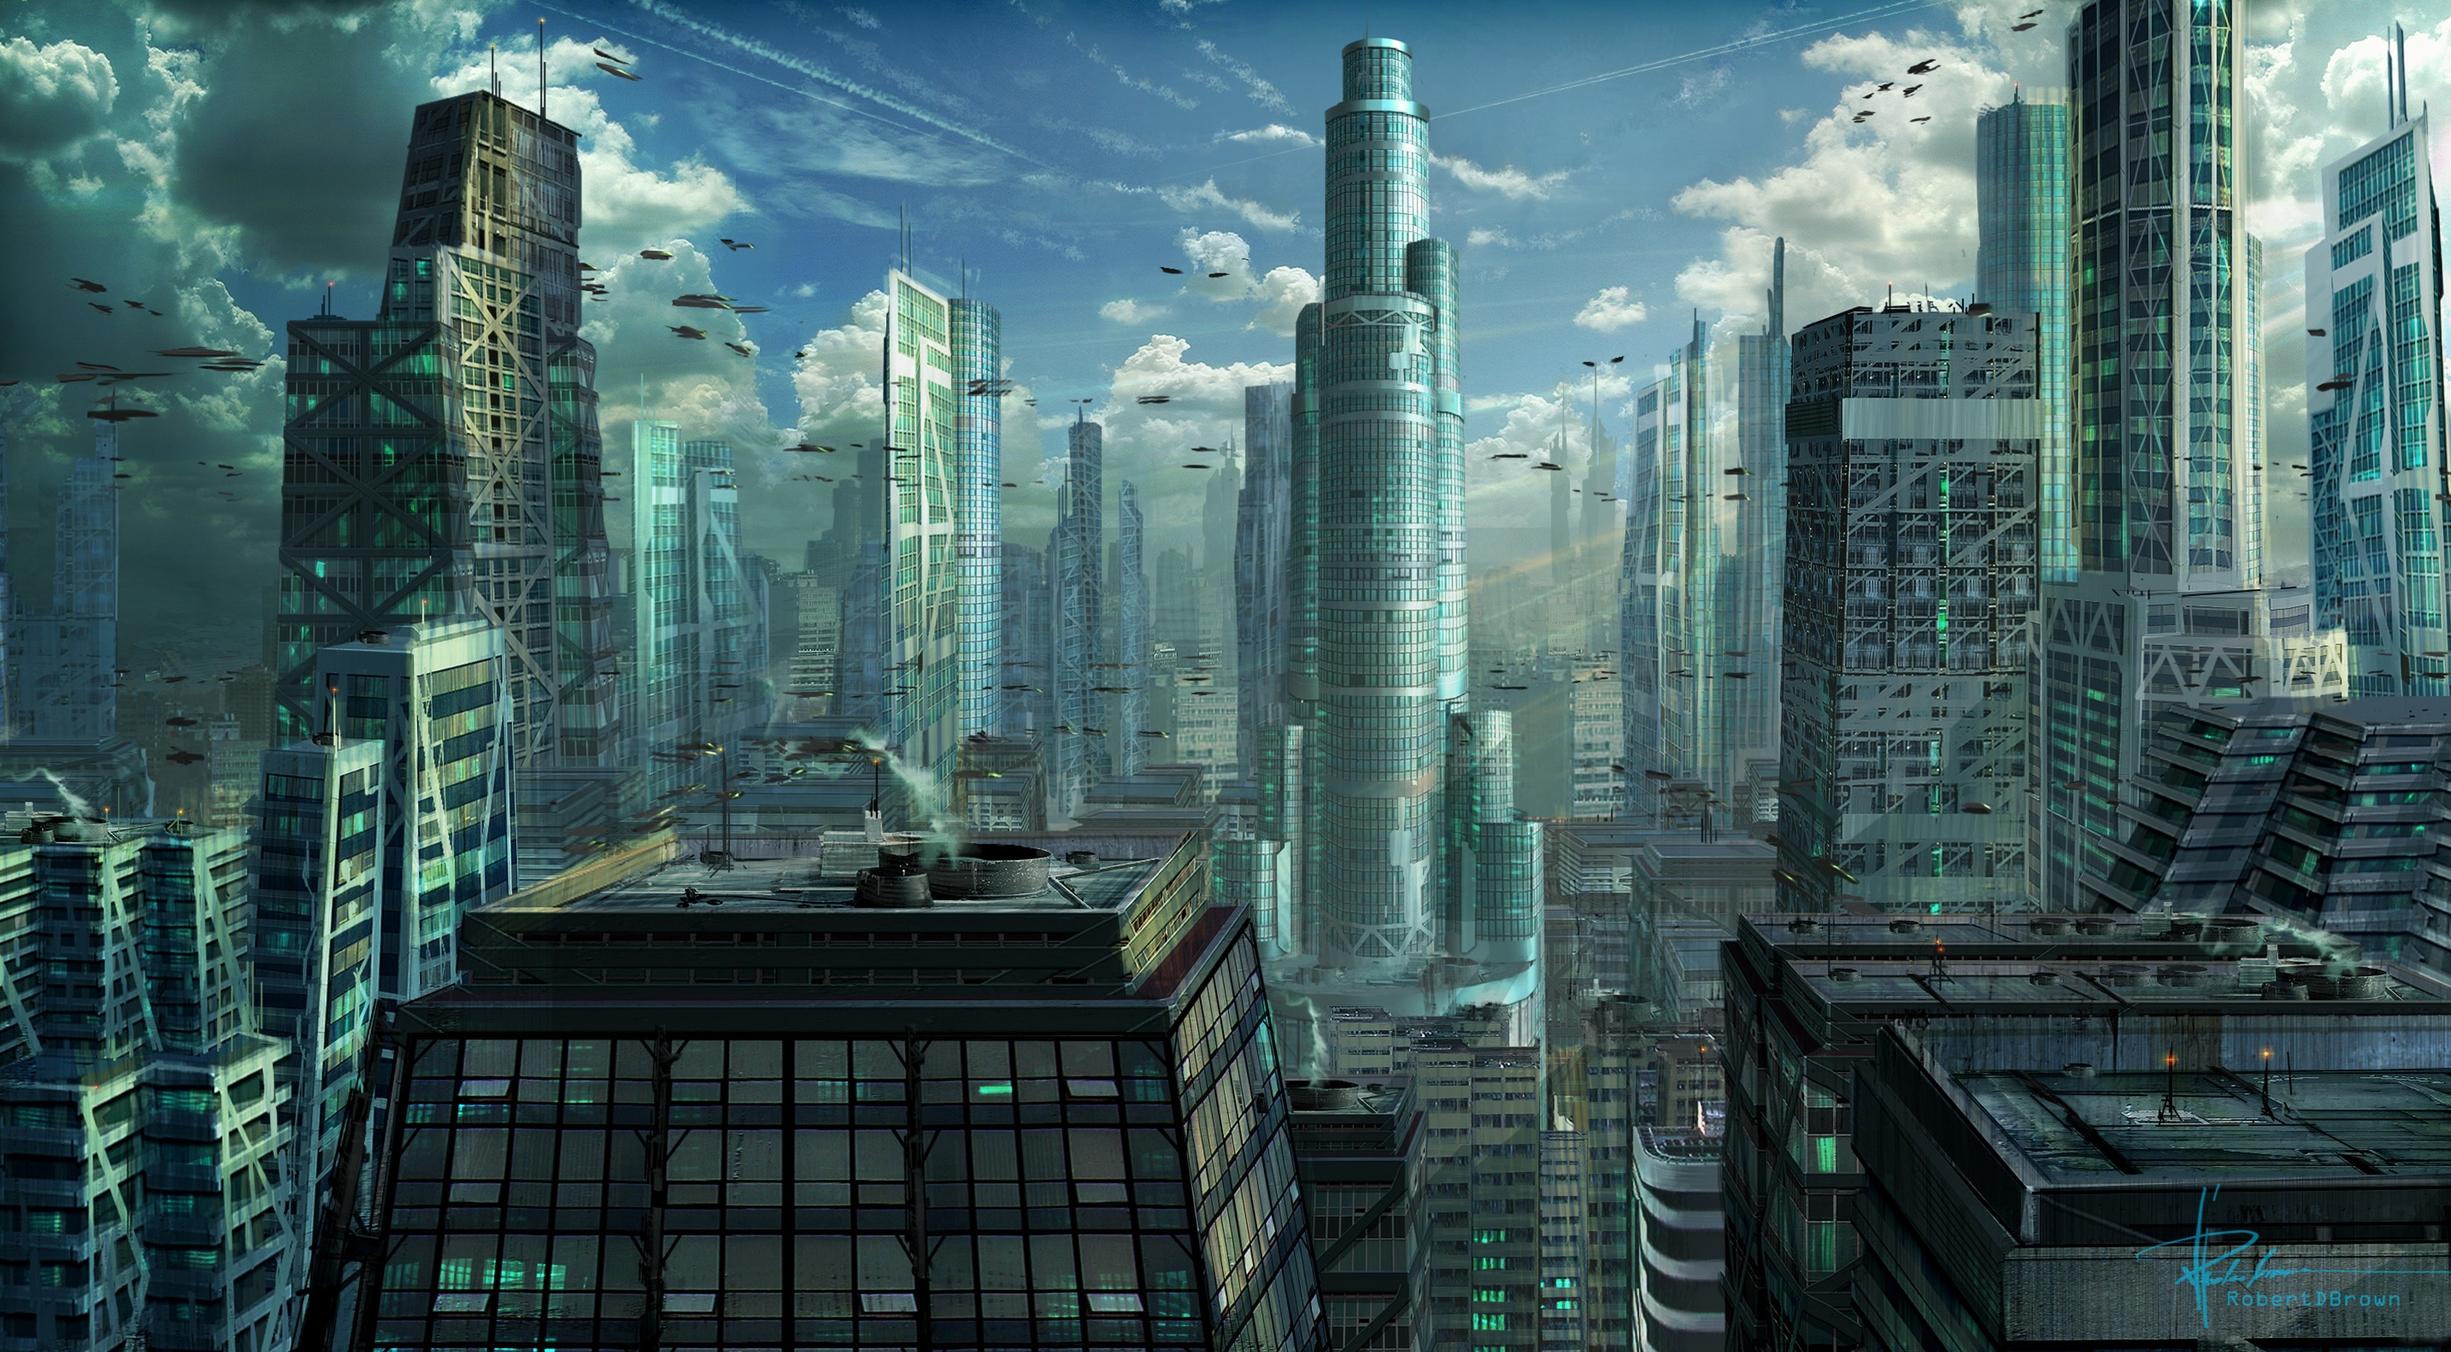 future_city_conceptart.jpg